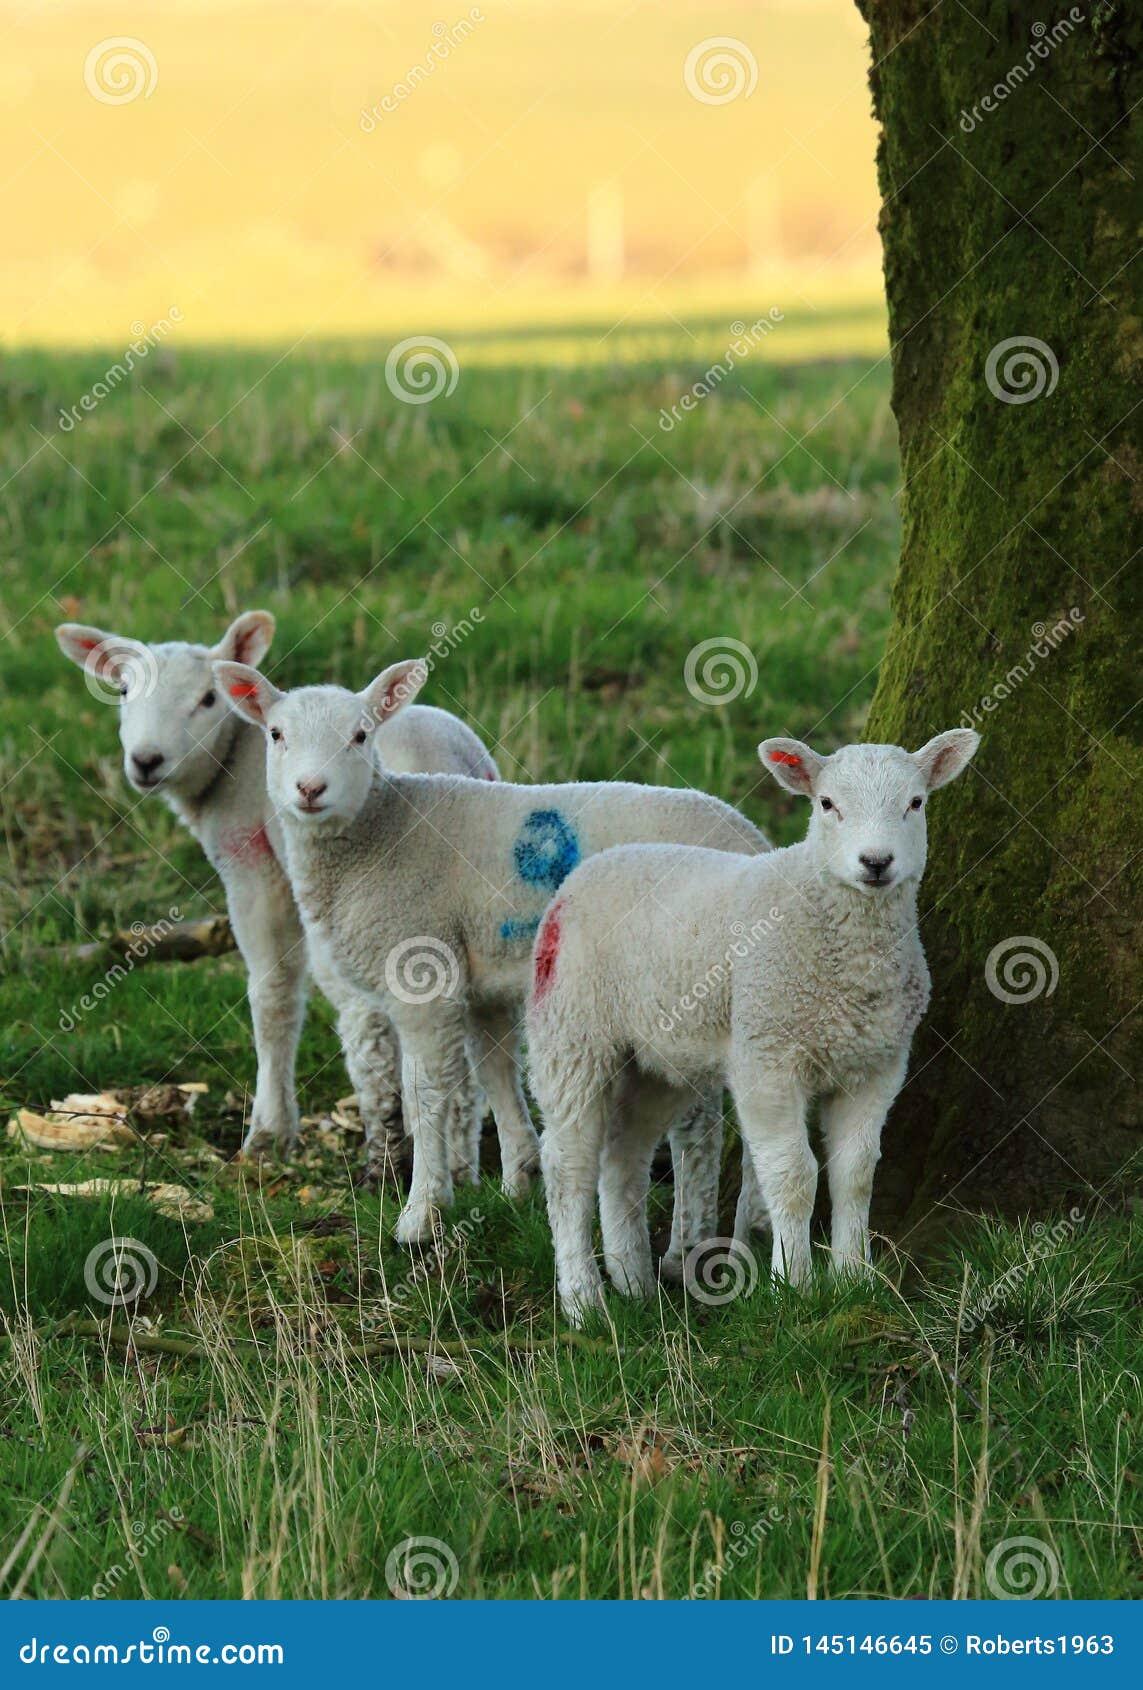 Three lambs standing under a tree